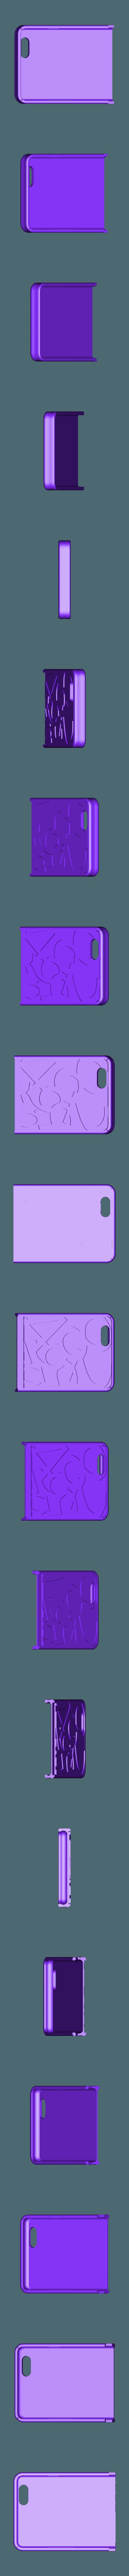 iphone6s_case_107_top.stl Download free STL file iPhone6 case • Design to 3D print, tofuji